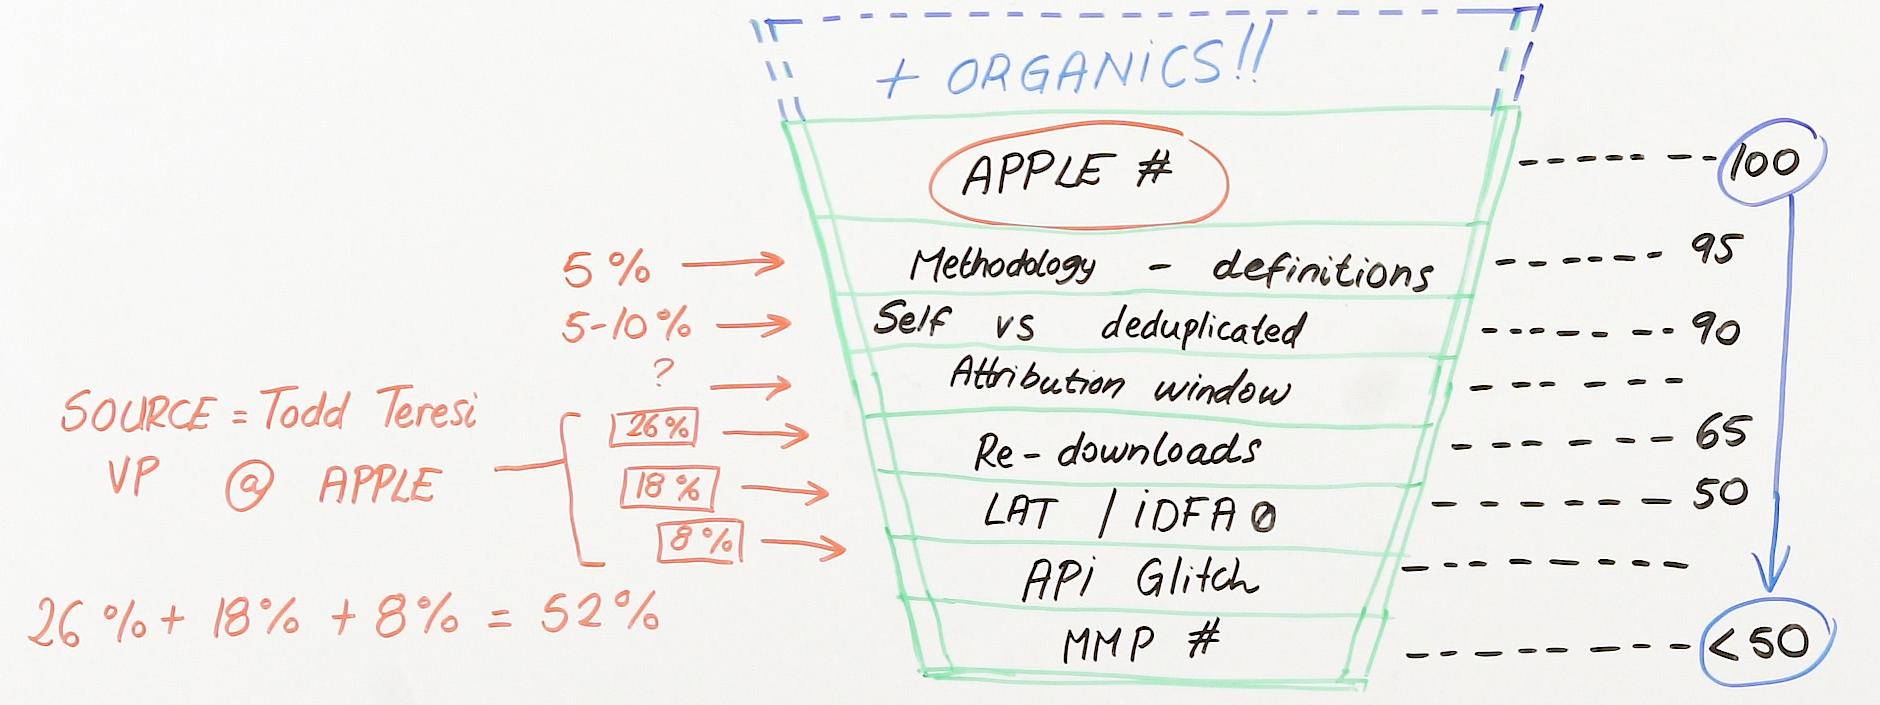 mama boards apple search ads